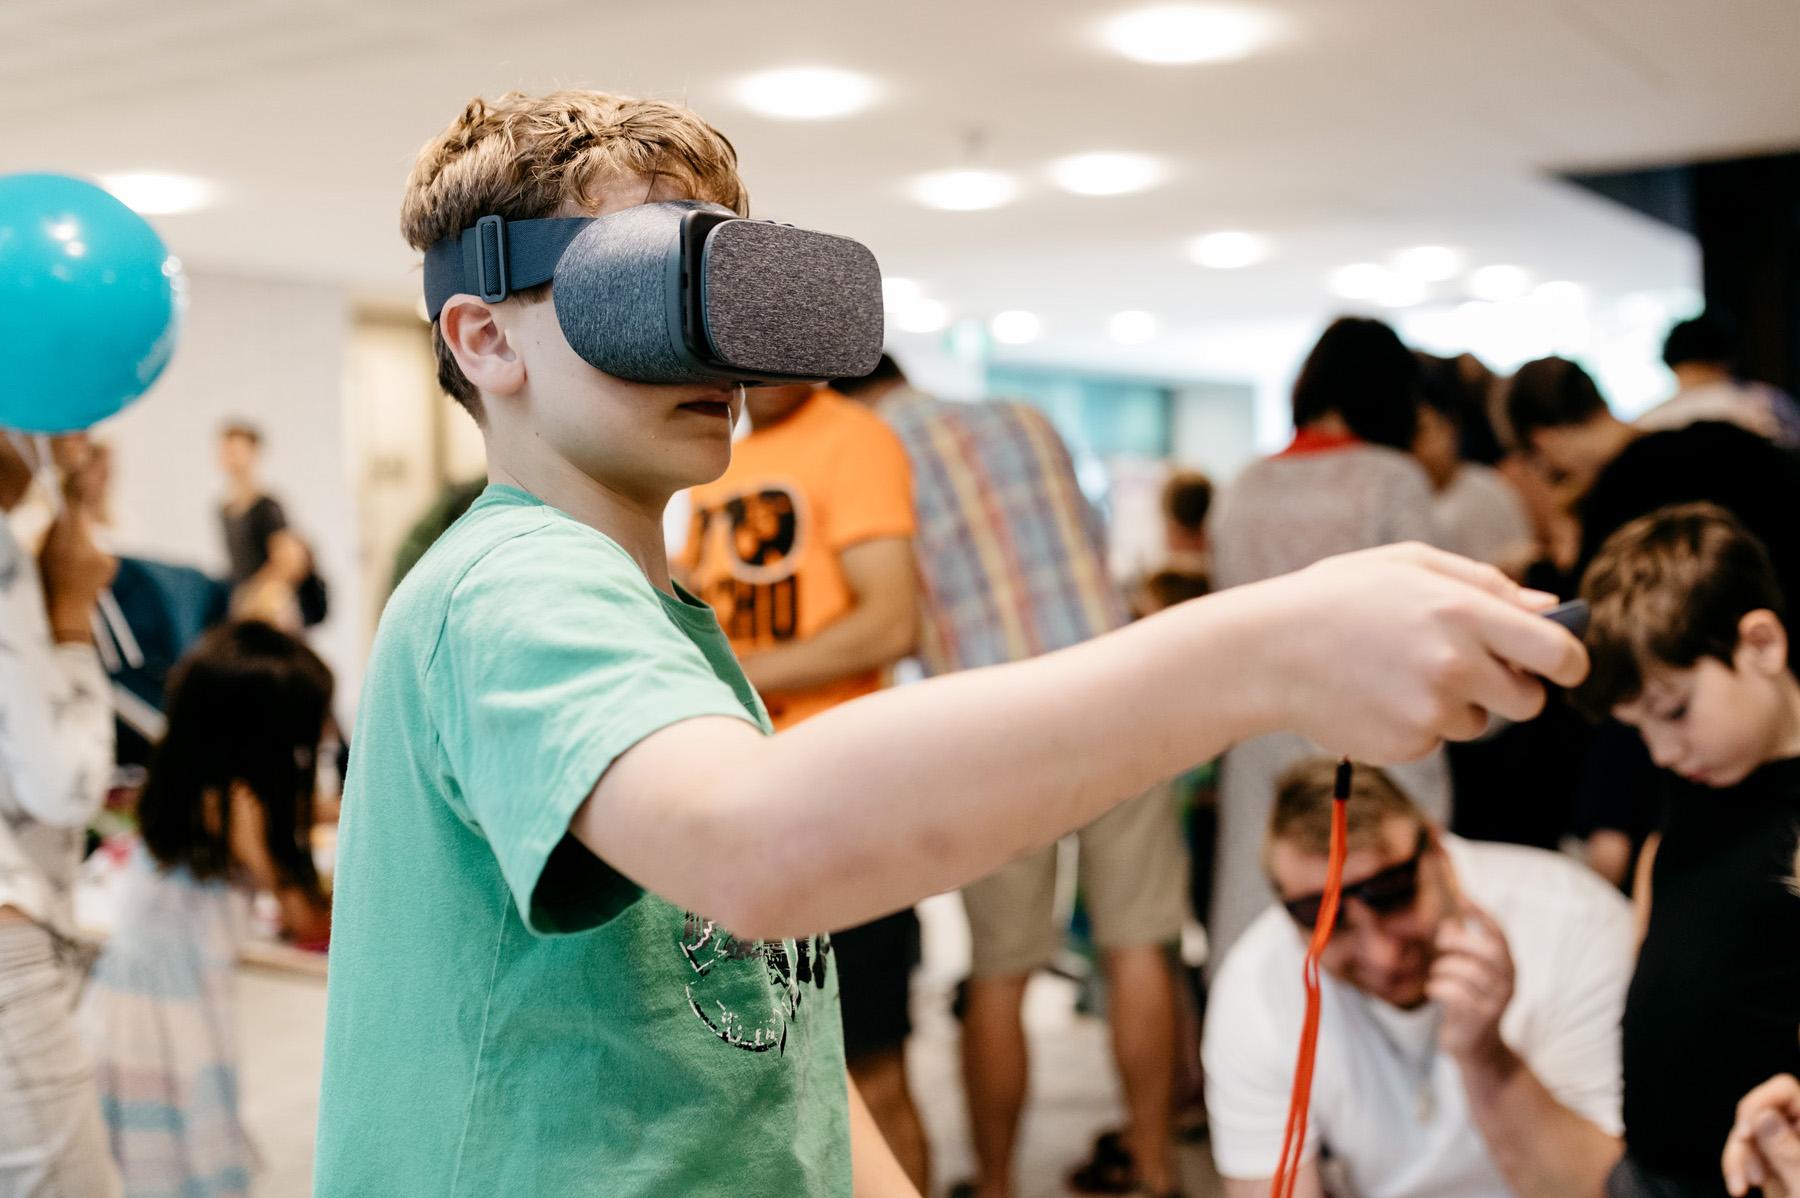 SLQ Summer Festival - Capturing 360 Perspectives